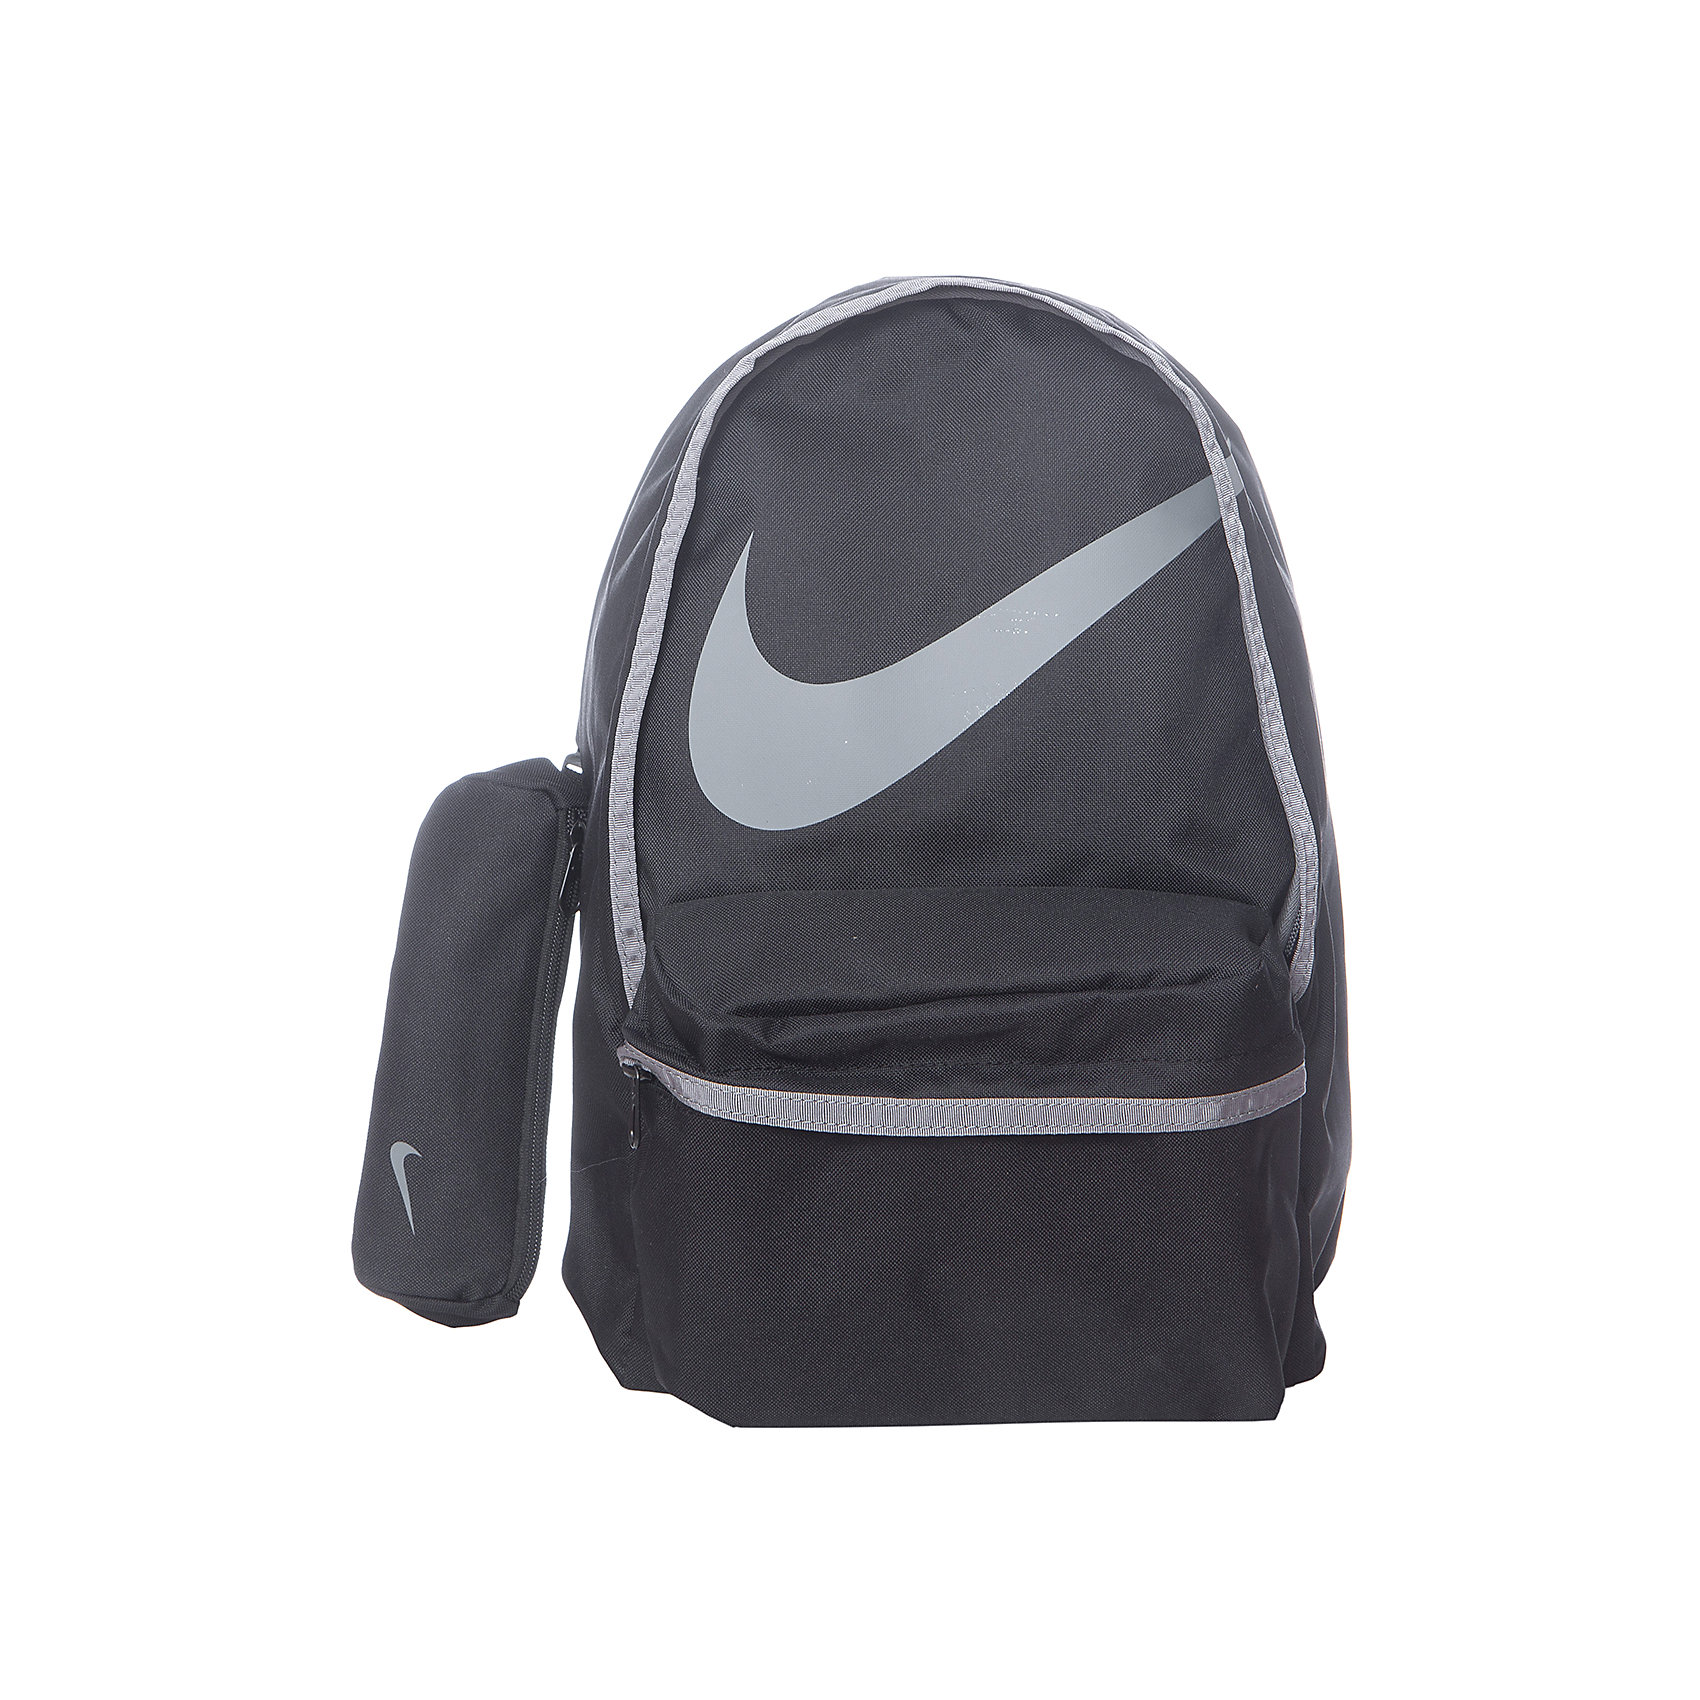 Рюкзак для мальчика NIKE YOUNG ATHLETES HALFDAY BT NIKEДорожные сумки и чемоданы<br>Рюкзак NIKE YOUNG ATHLETES HALFDAY BT от марки  NIKE.<br>Состав:<br>полиэстер 100%<br><br>Ширина мм: 170<br>Глубина мм: 157<br>Высота мм: 67<br>Вес г: 117<br>Цвет: черный<br>Возраст от месяцев: 48<br>Возраст до месяцев: 120<br>Пол: Мужской<br>Возраст: Детский<br>Размер: one size<br>SKU: 4044708